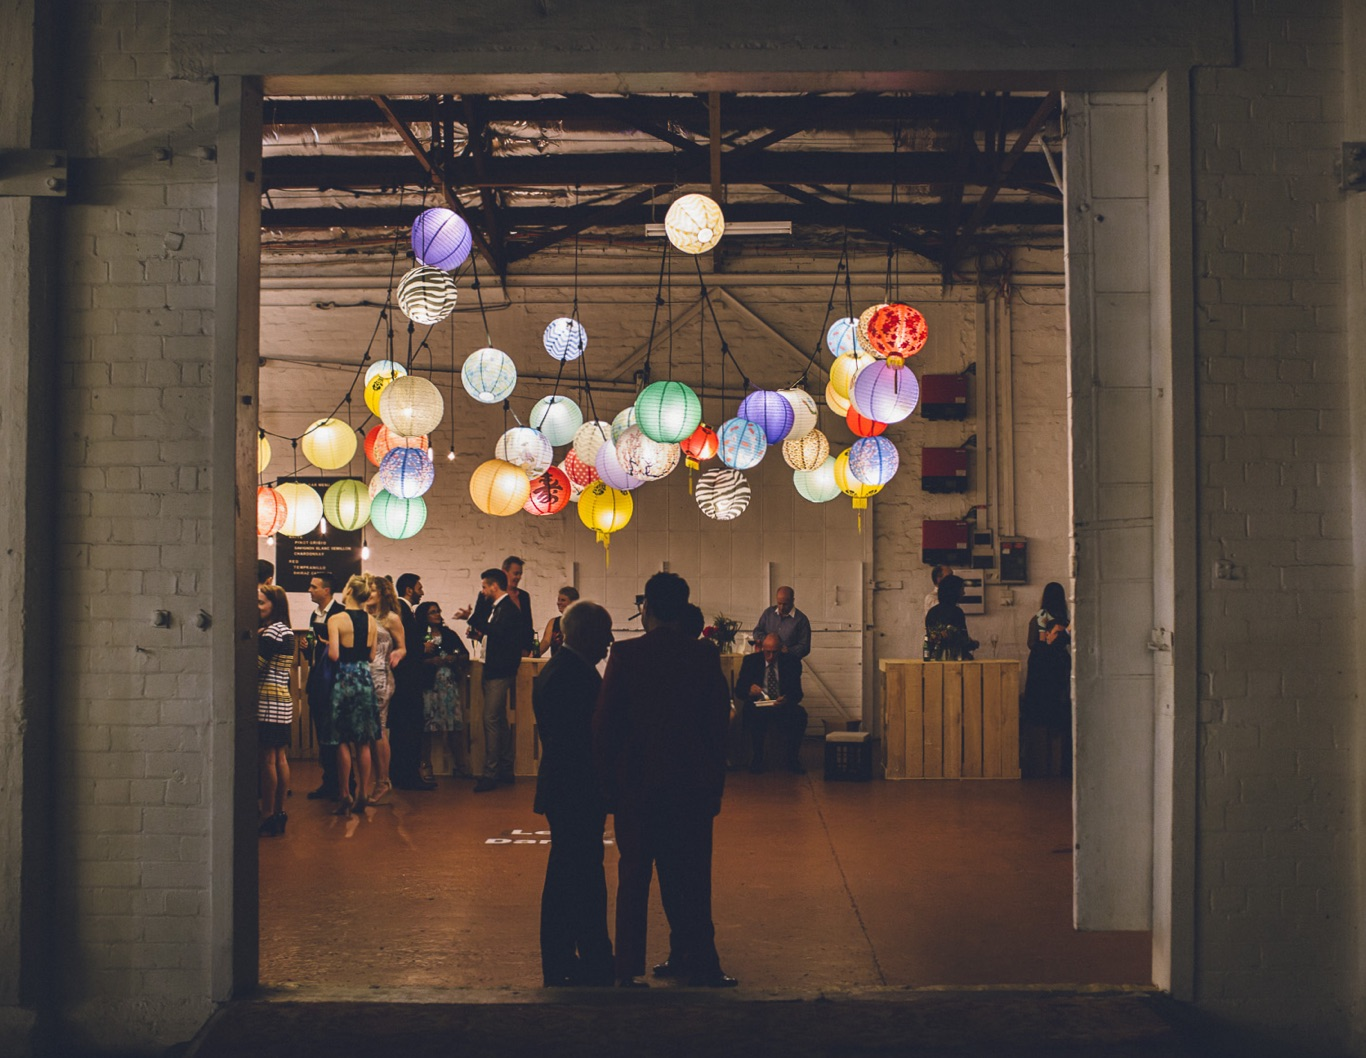 Weddings guests under light installation inside a barn.